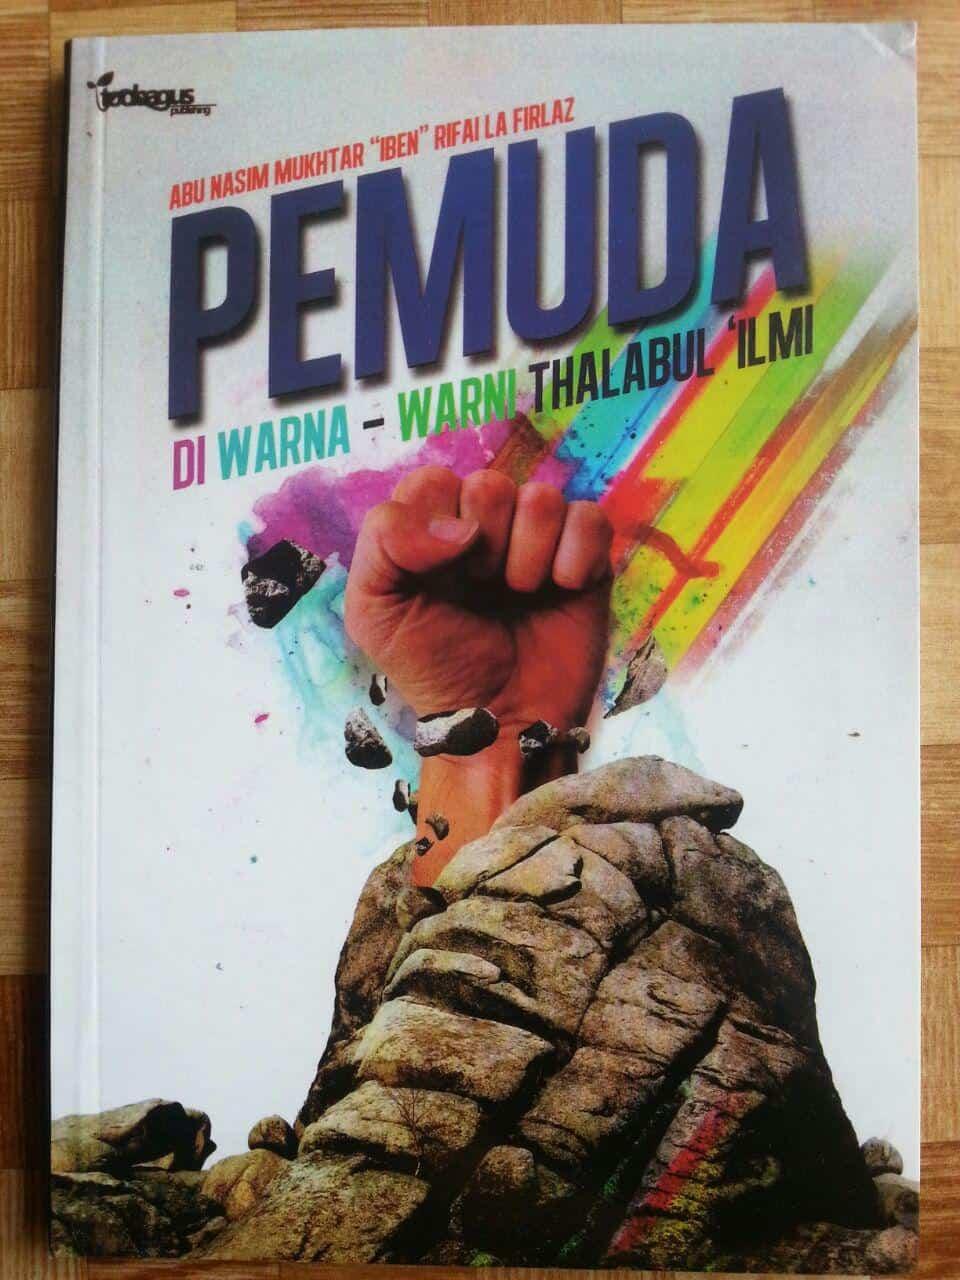 Buku Pemuda Di Warna-Warni Thalabul Ilmi cover 2